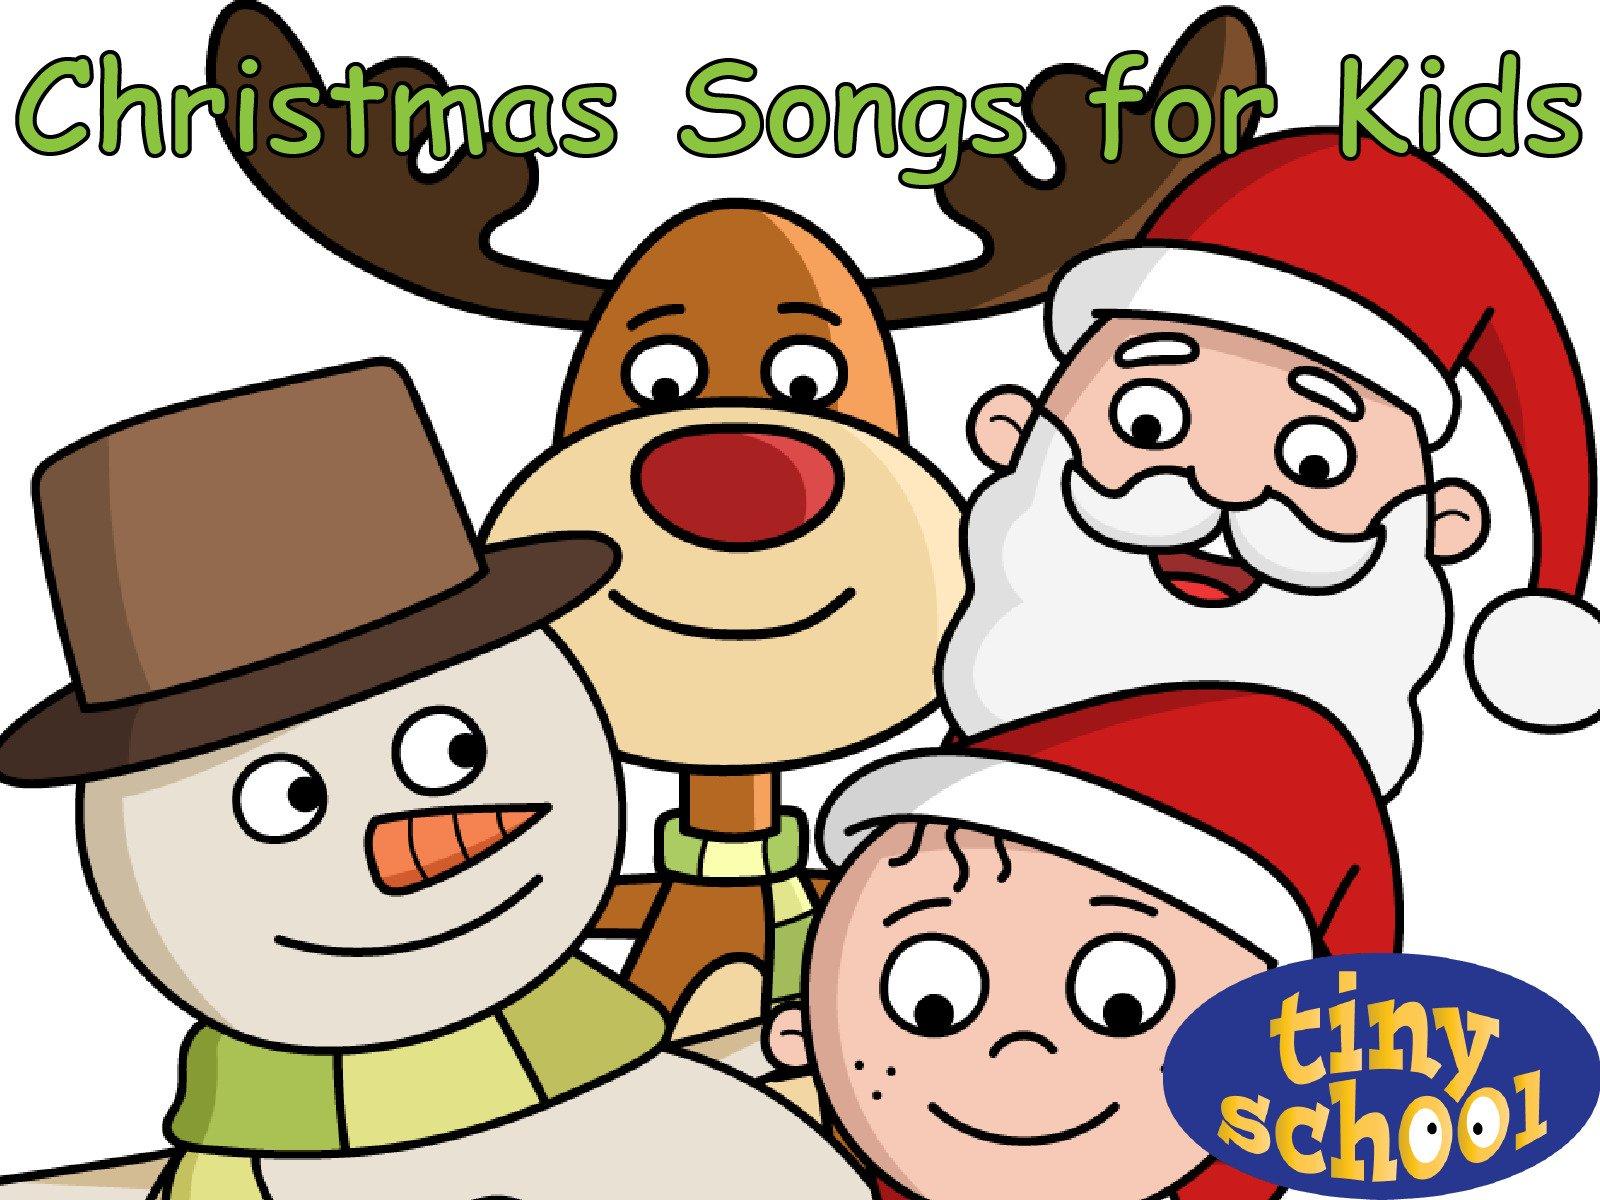 Amazon.com: Watch Christmas Songs for Kids - Tinyschool | Prime Video